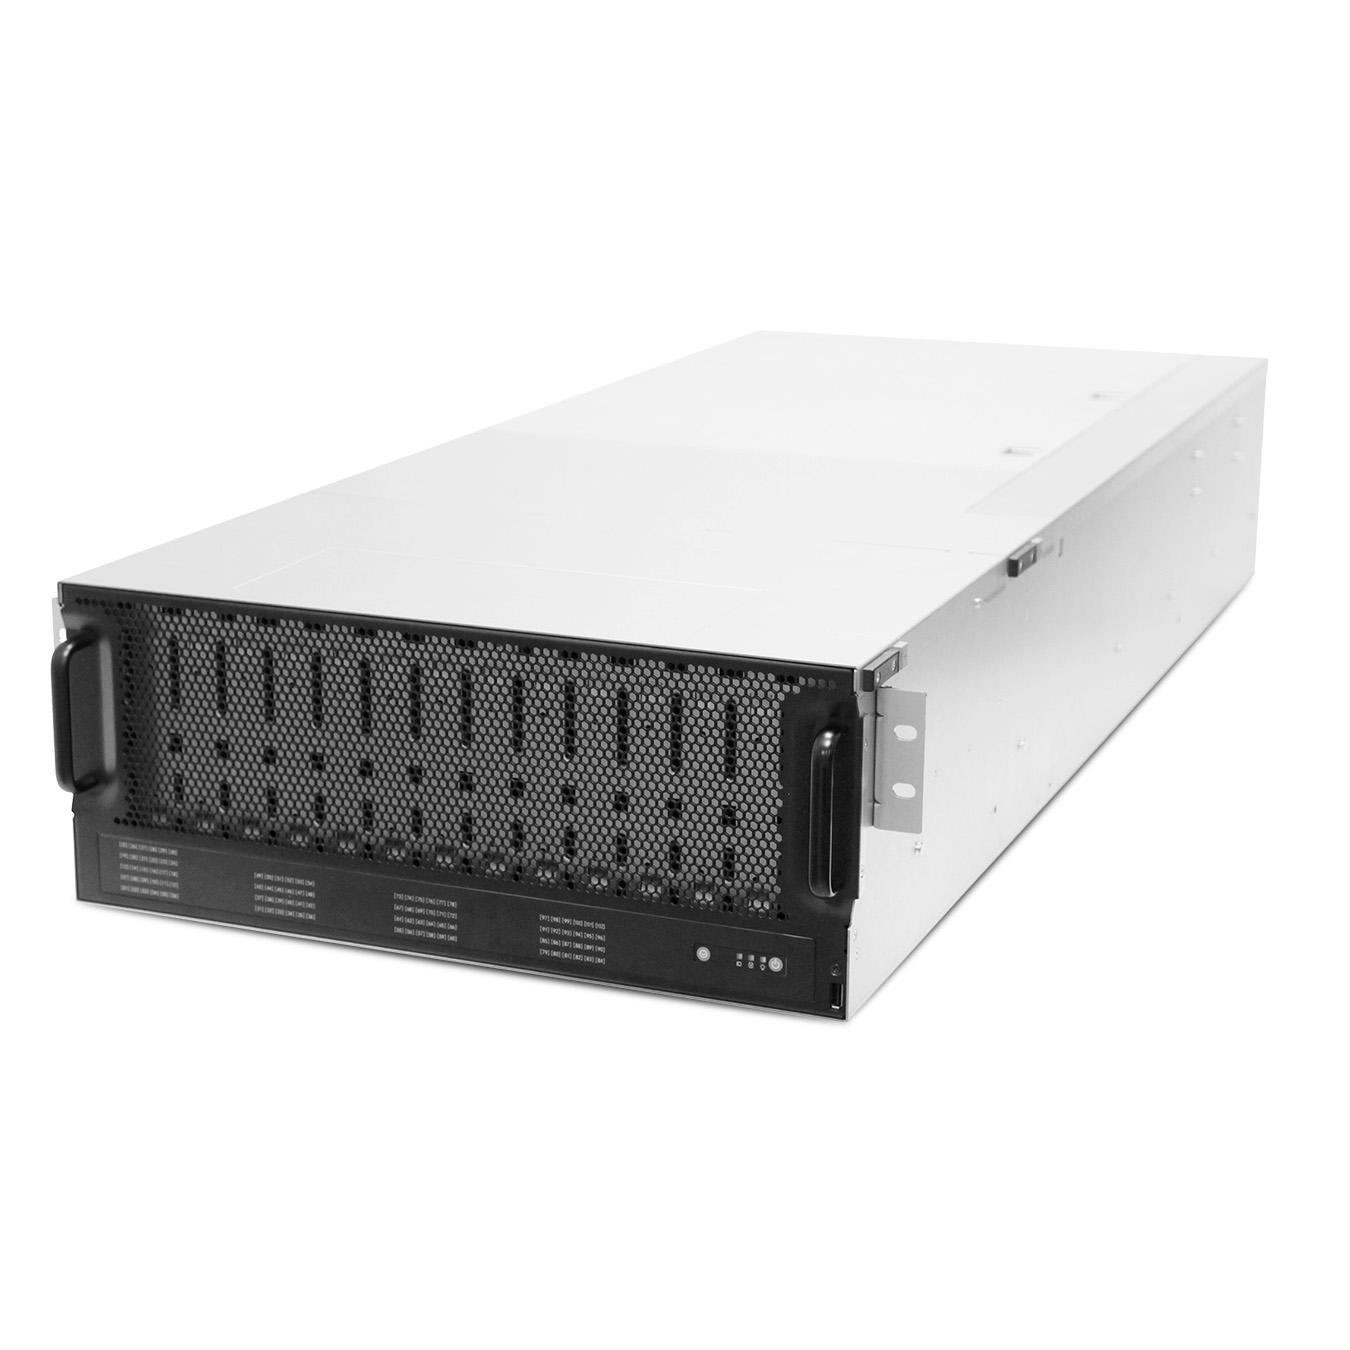 4U 102 3.5inch bays Open-E Storage Server v2